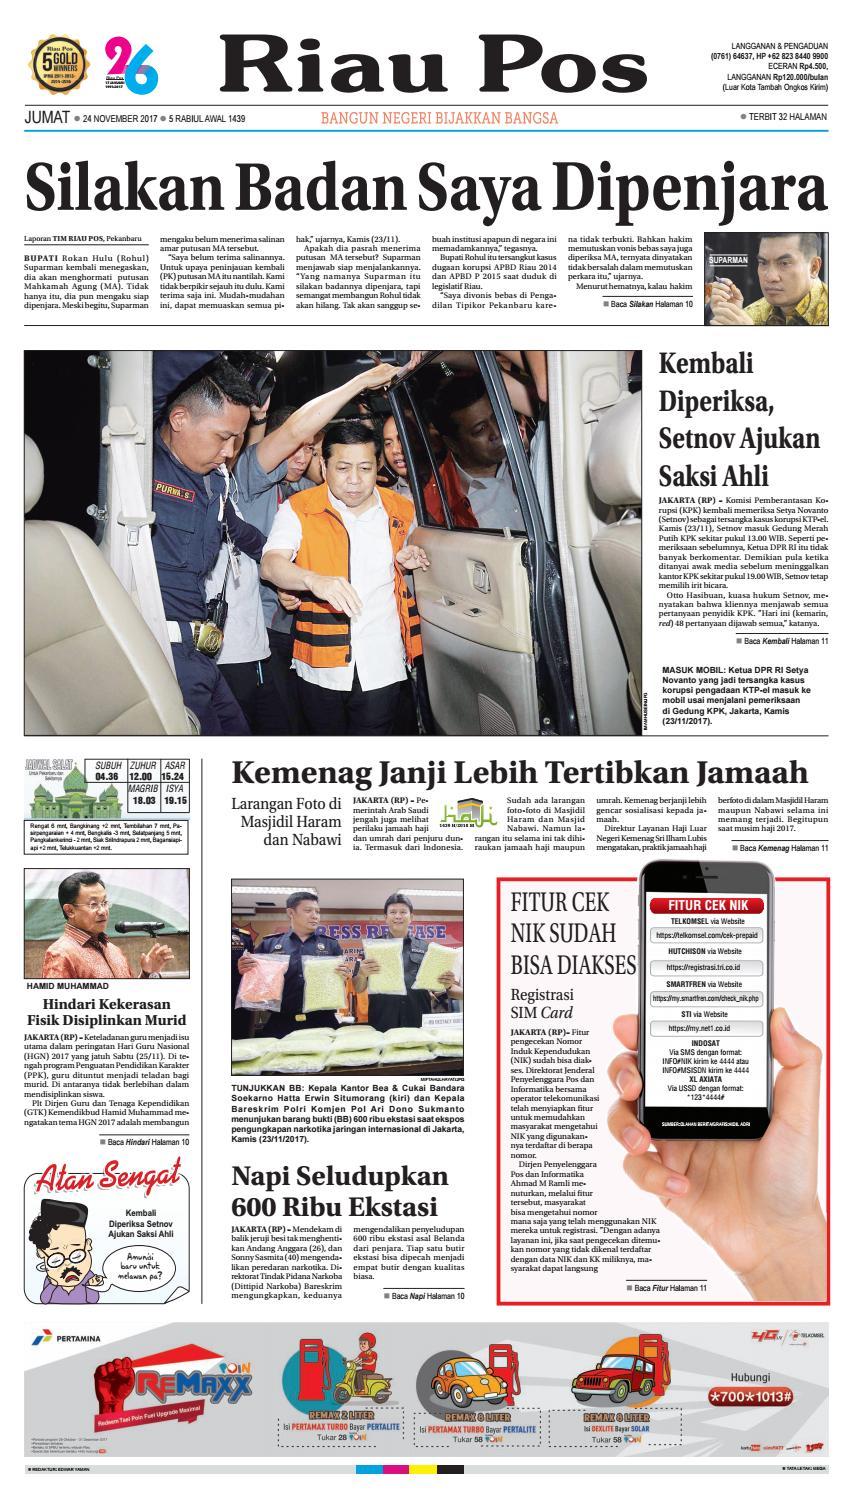 2017 11 24 By Riau Pos Issuu Produk Ukm Bumn Pasmina Glitter